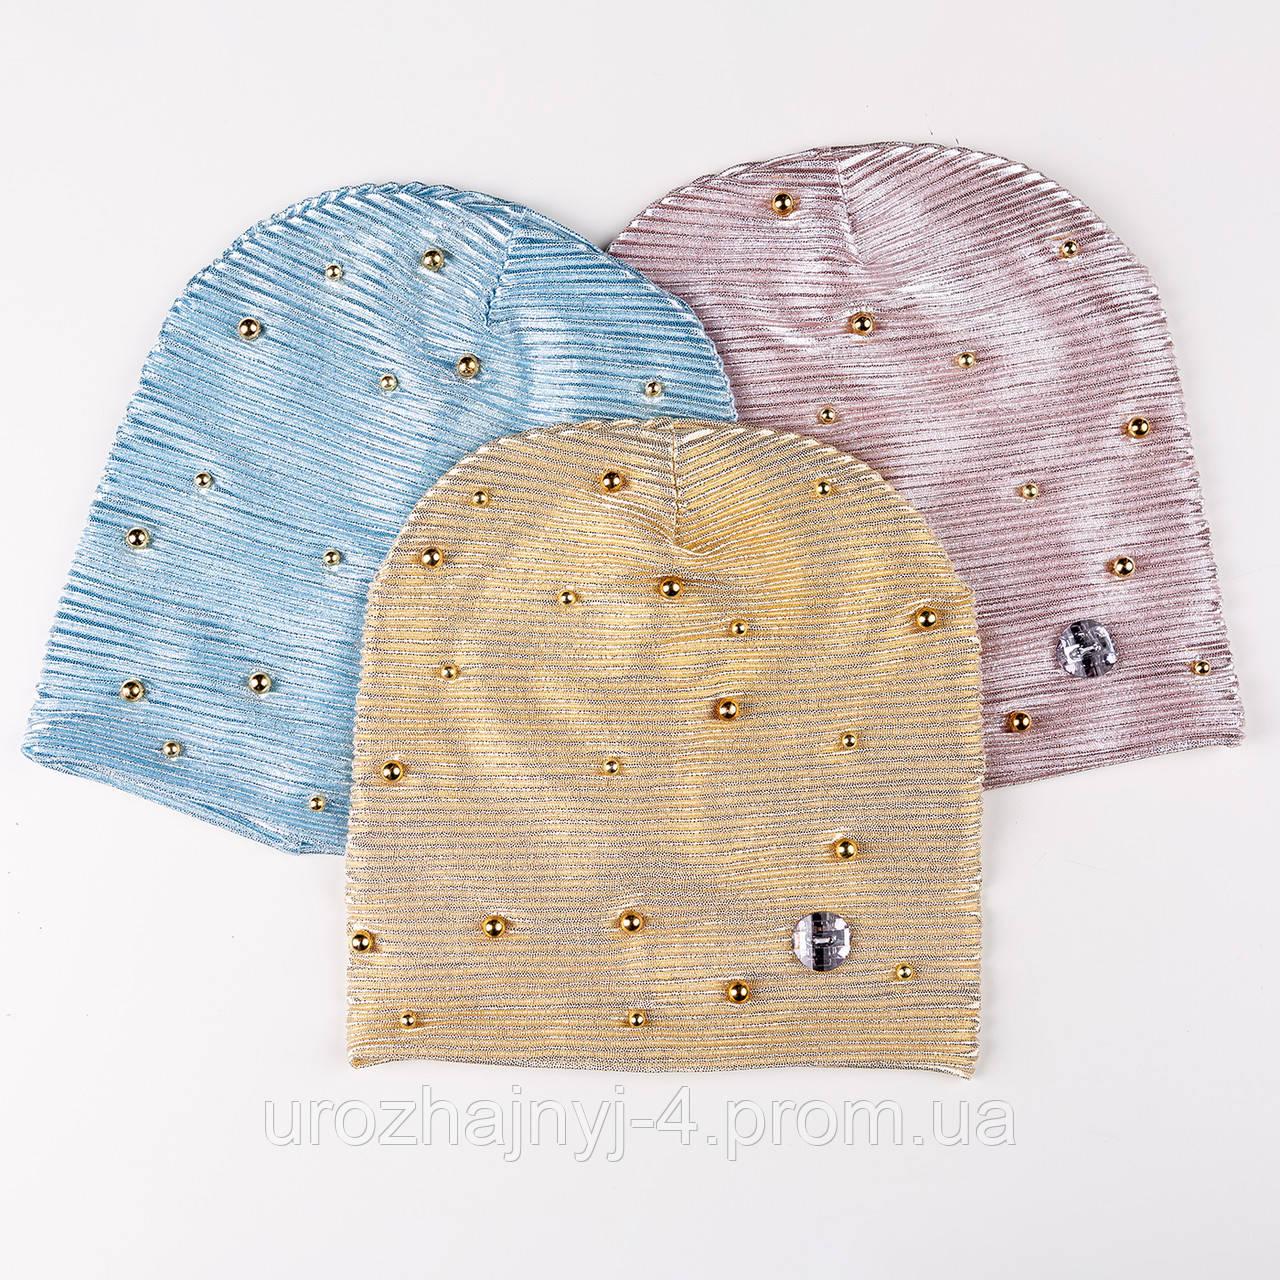 Трикотажная шапка весна для девочки подкладка х/б р48-50 упаковка 5шт